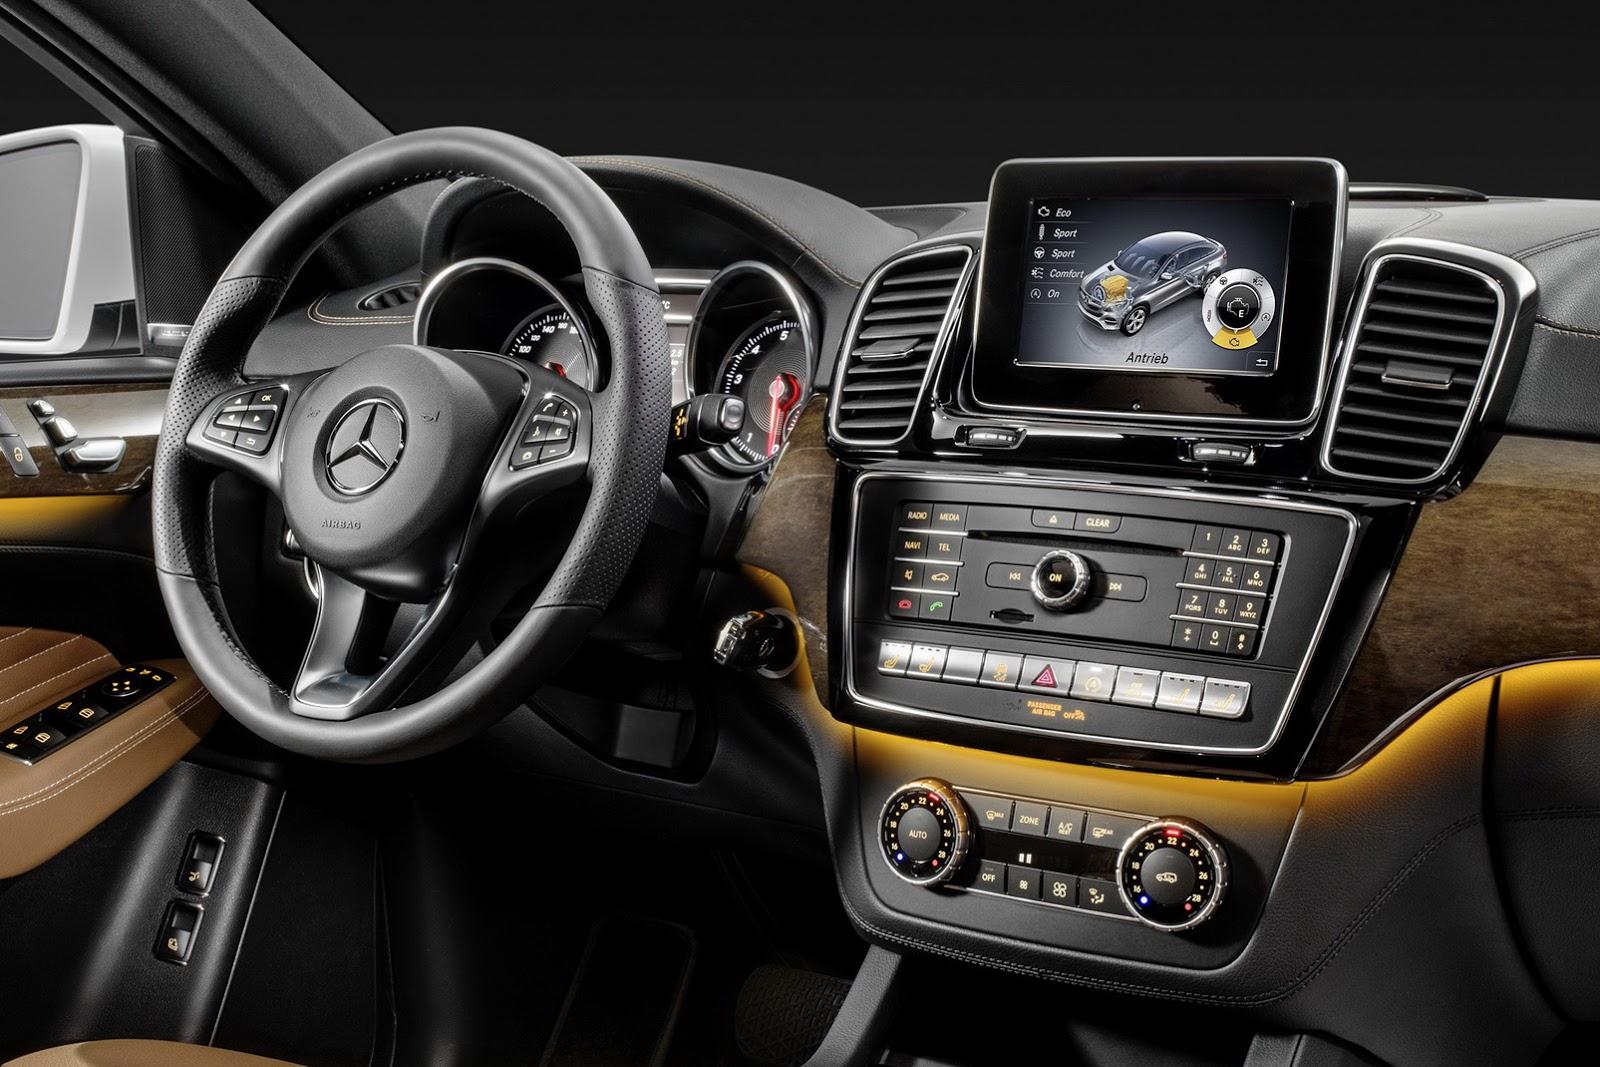 Mercedes Gle Coupe 2015 Pagina 5 Forocoches